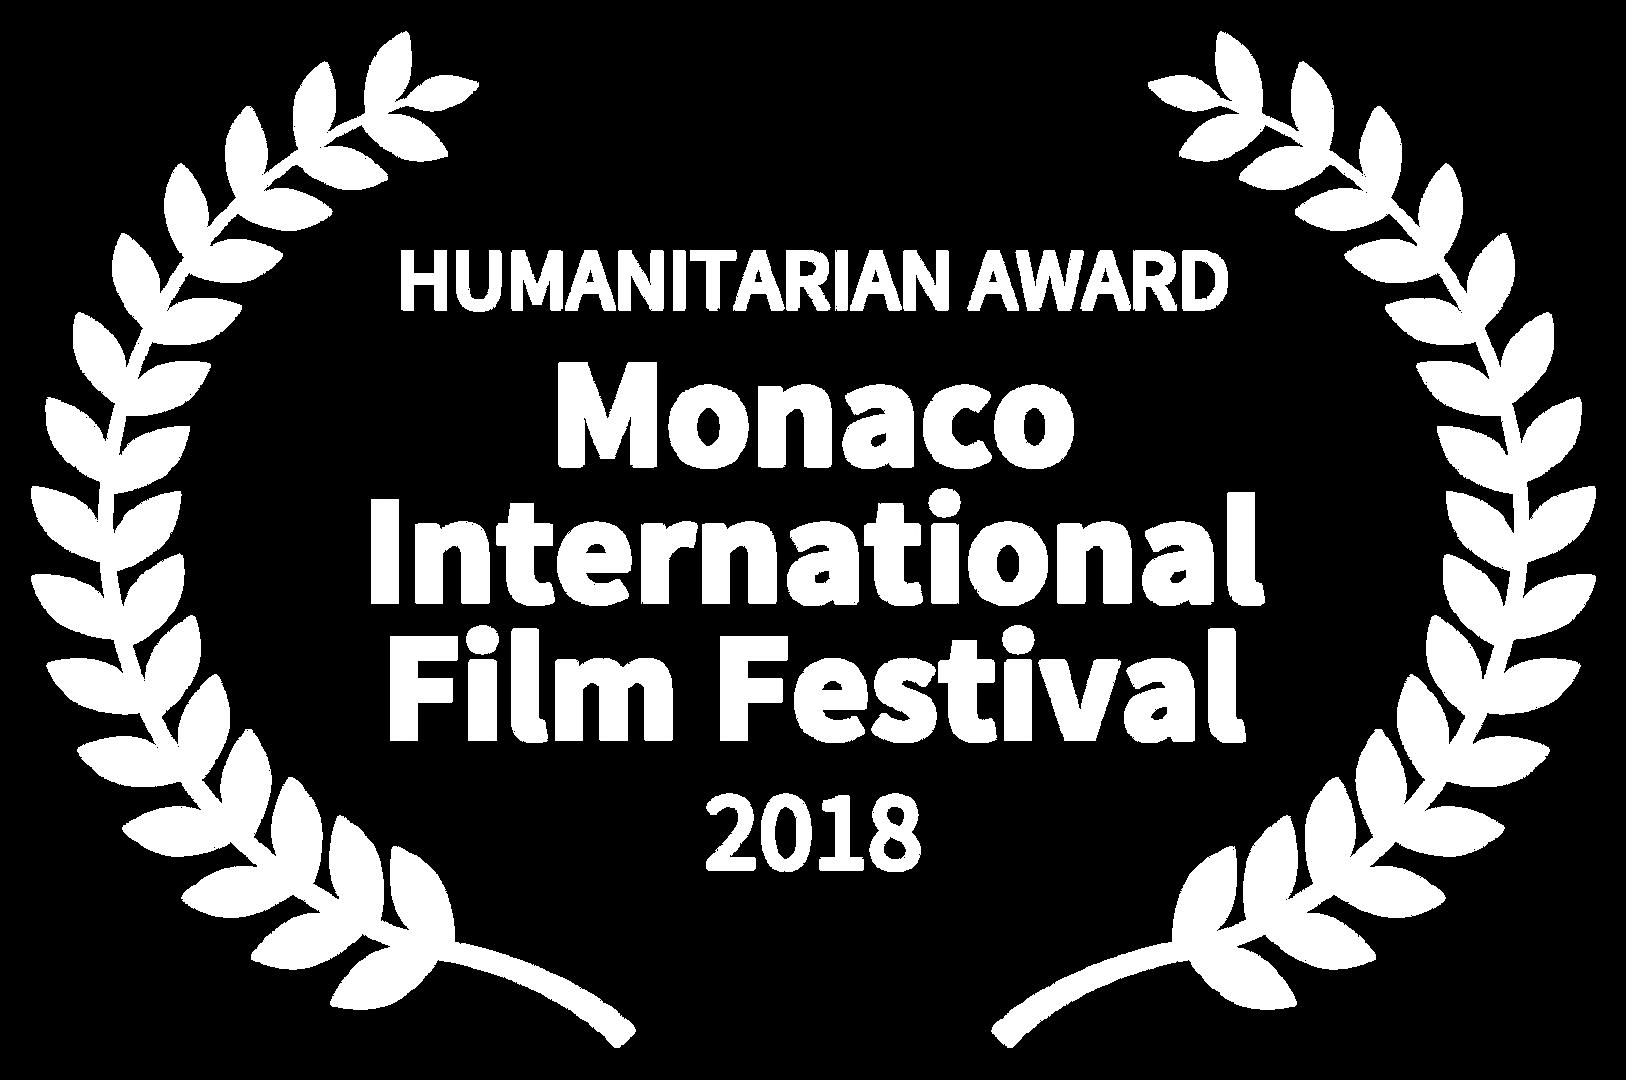 HUMANITARIAN AWARD - Monaco Internationa